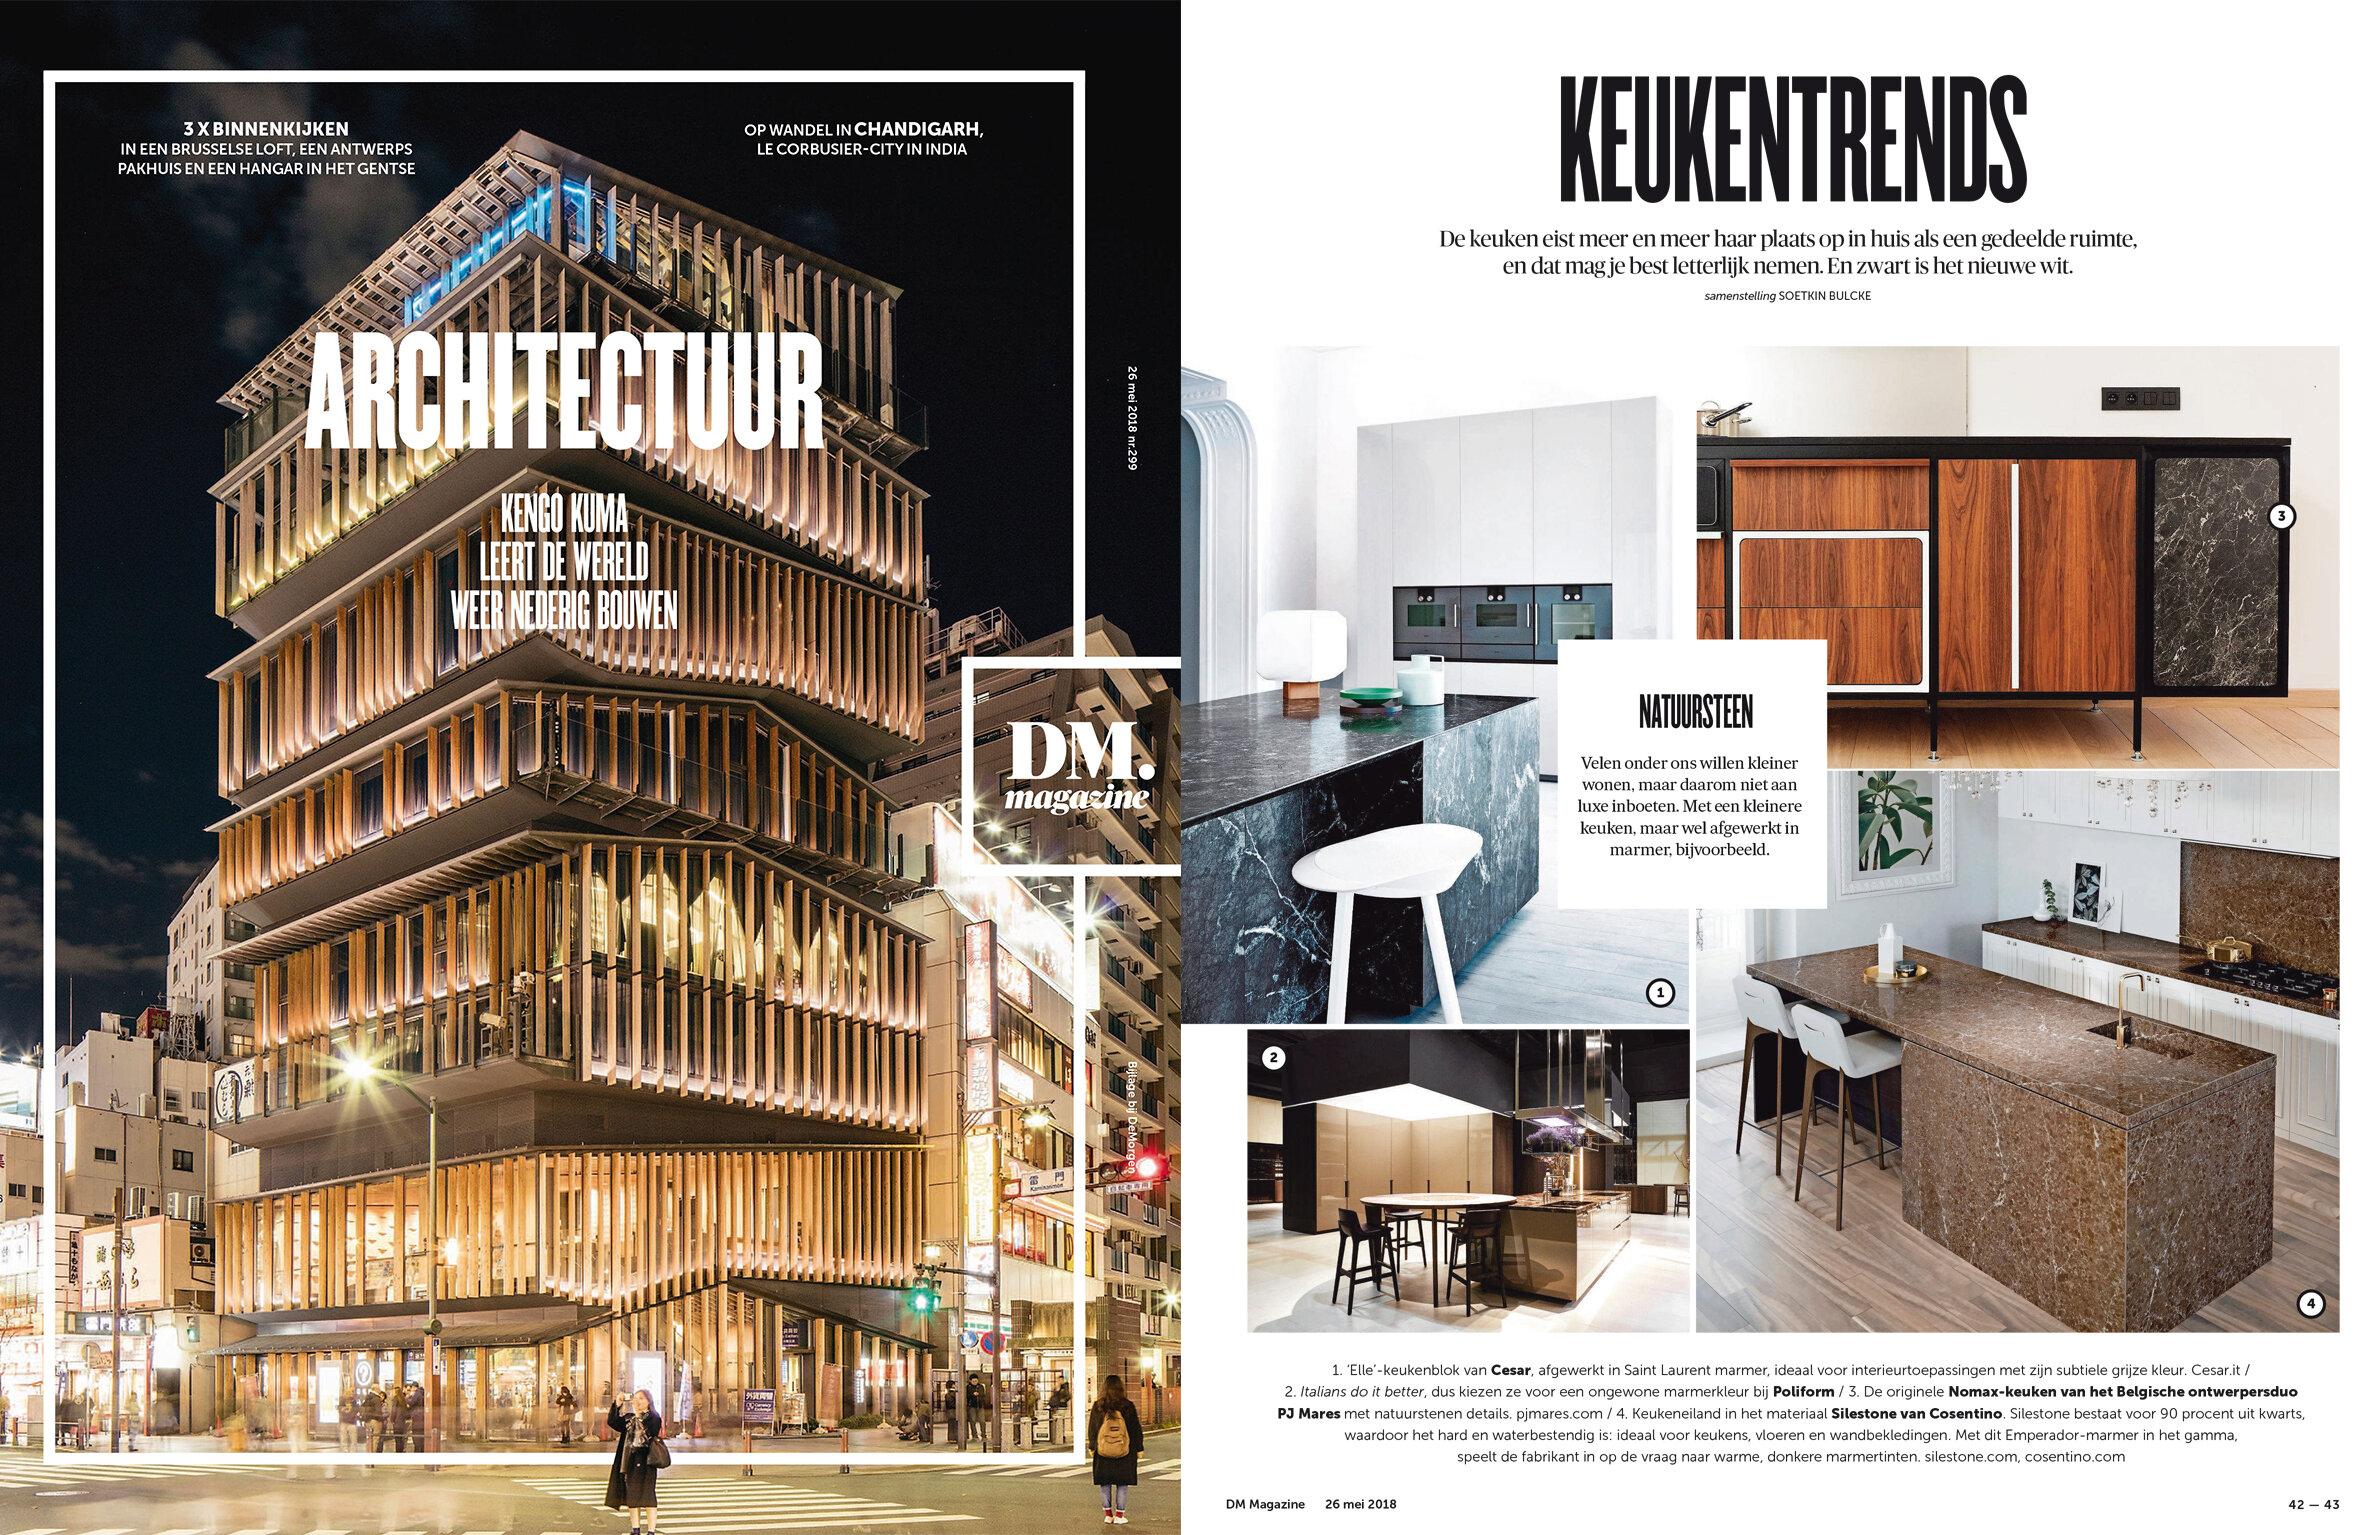 20180526_Demorgenmagazine1.jpg